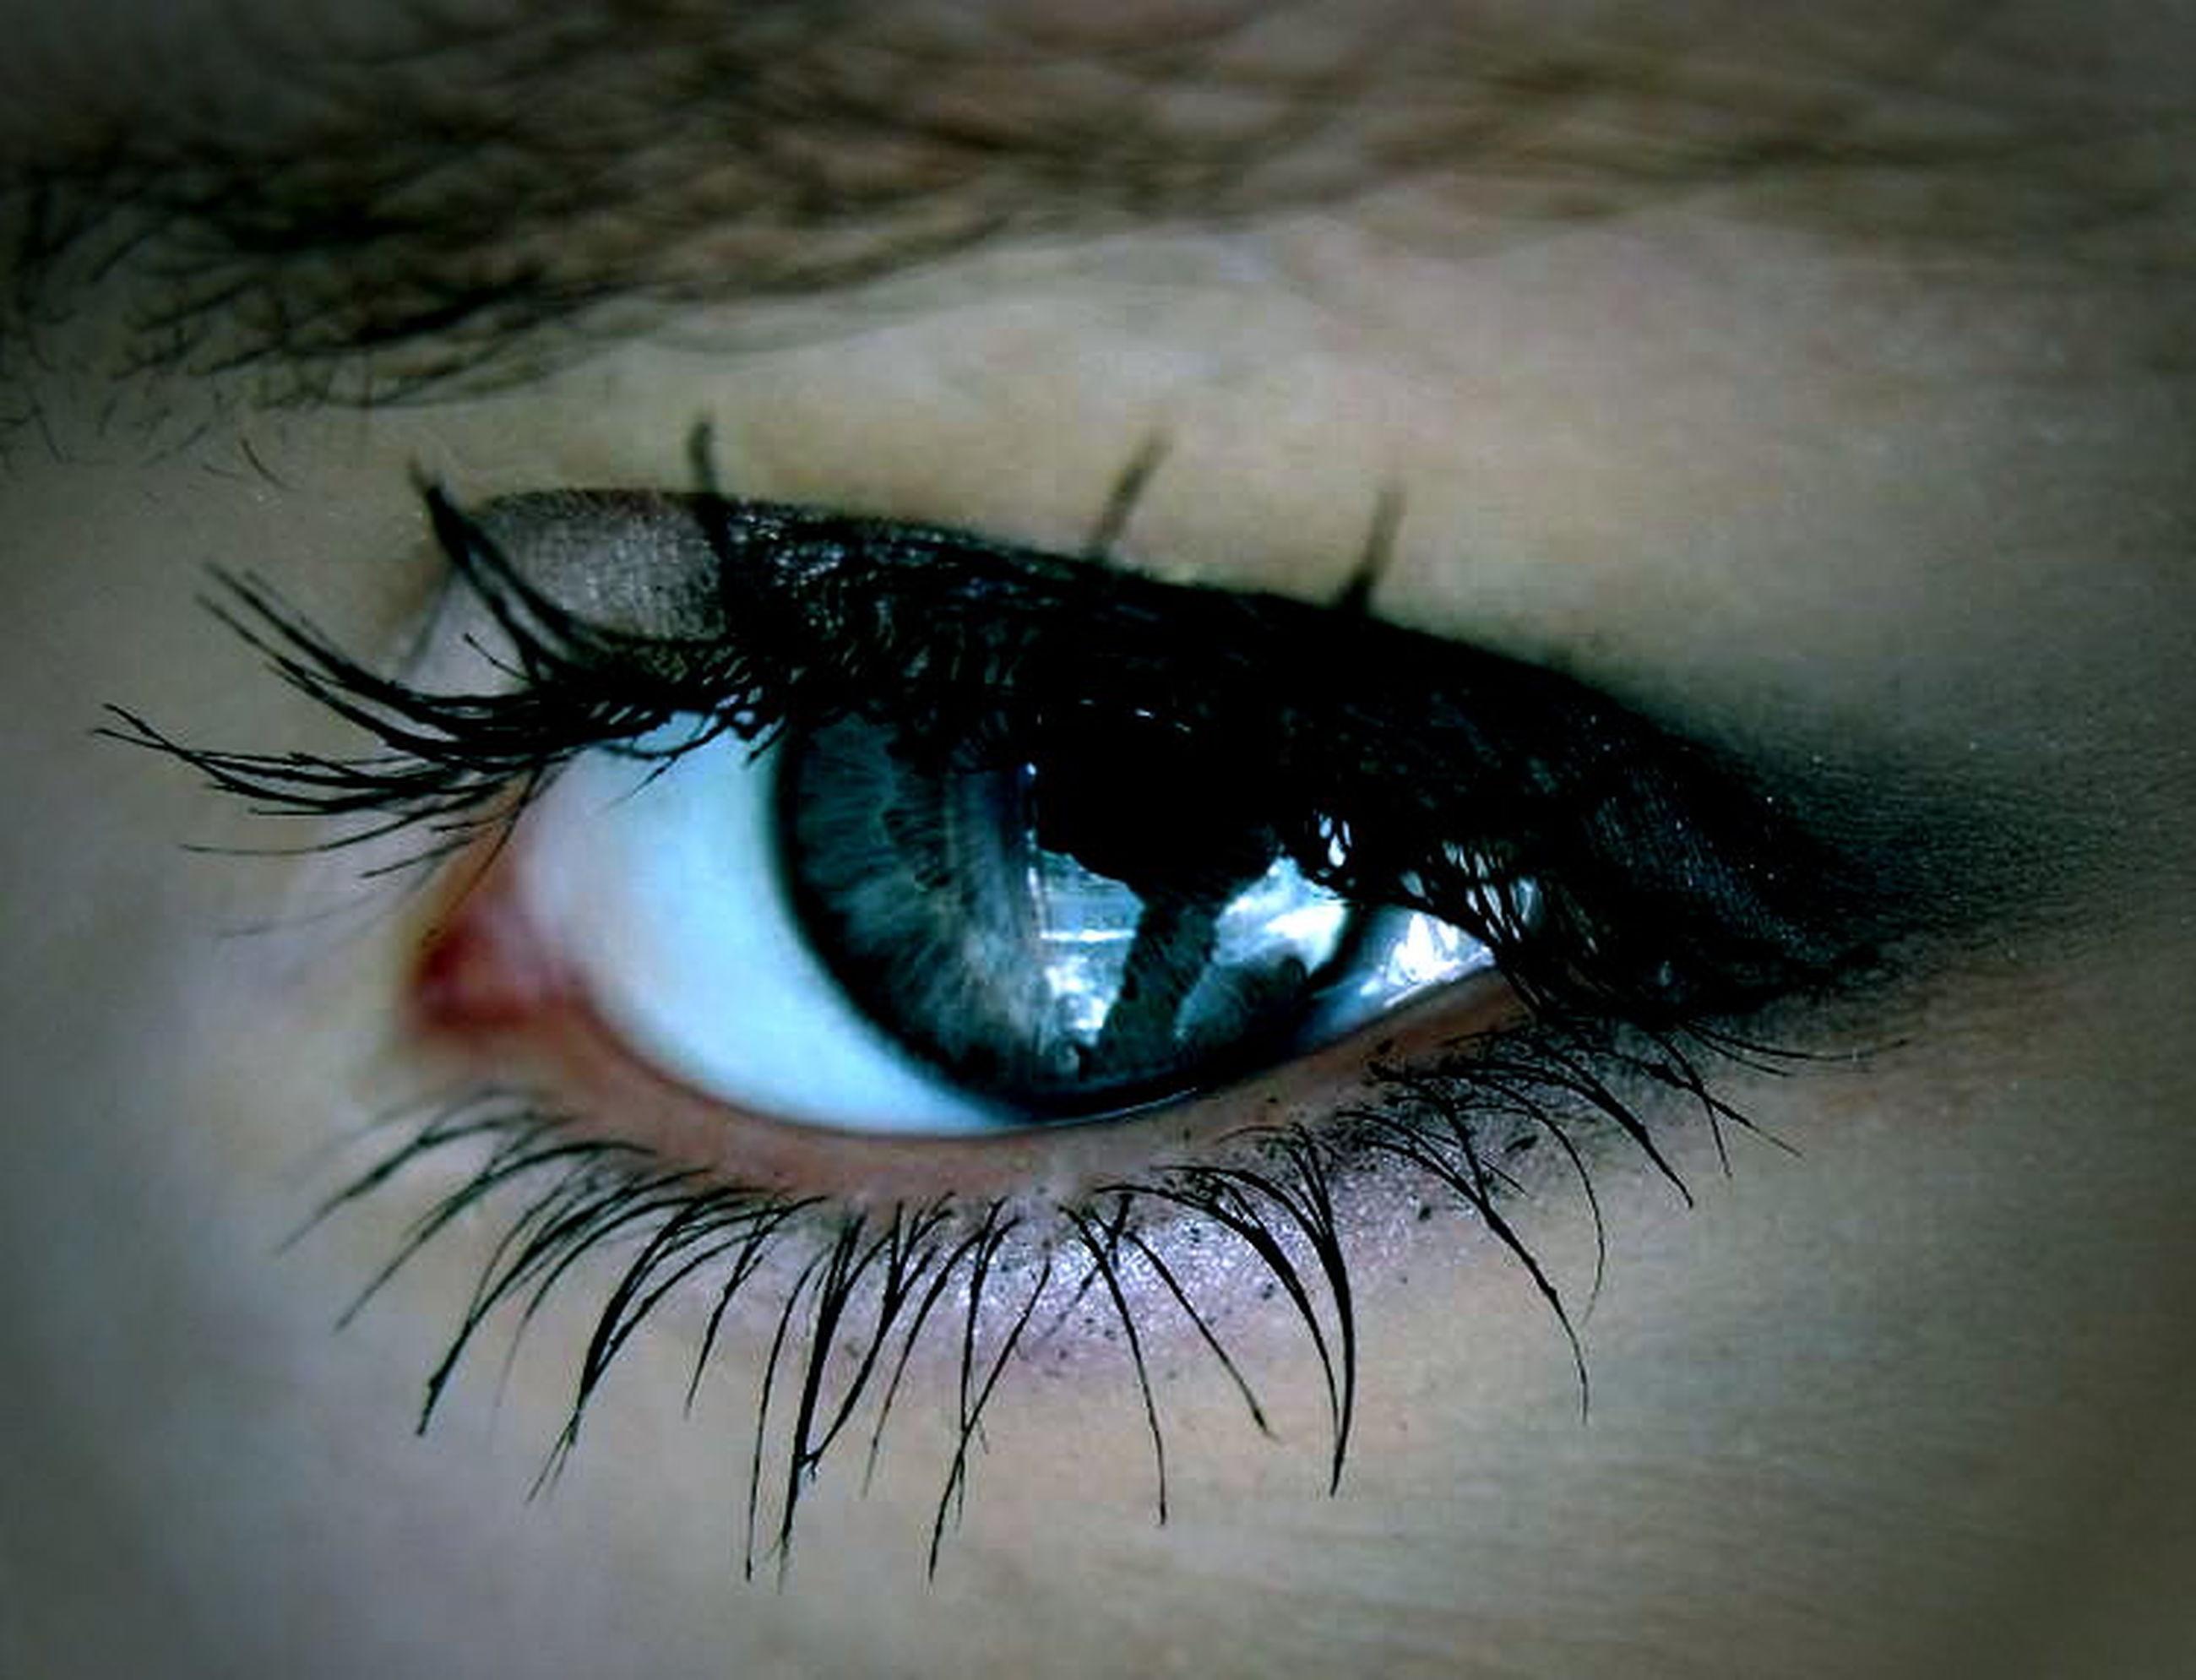 eyelash, human eye, close-up, eyesight, sensory perception, extreme close-up, human skin, part of, one animal, iris - eye, eyeball, unrecognizable person, extreme close up, looking at camera, macro, portrait, animal themes